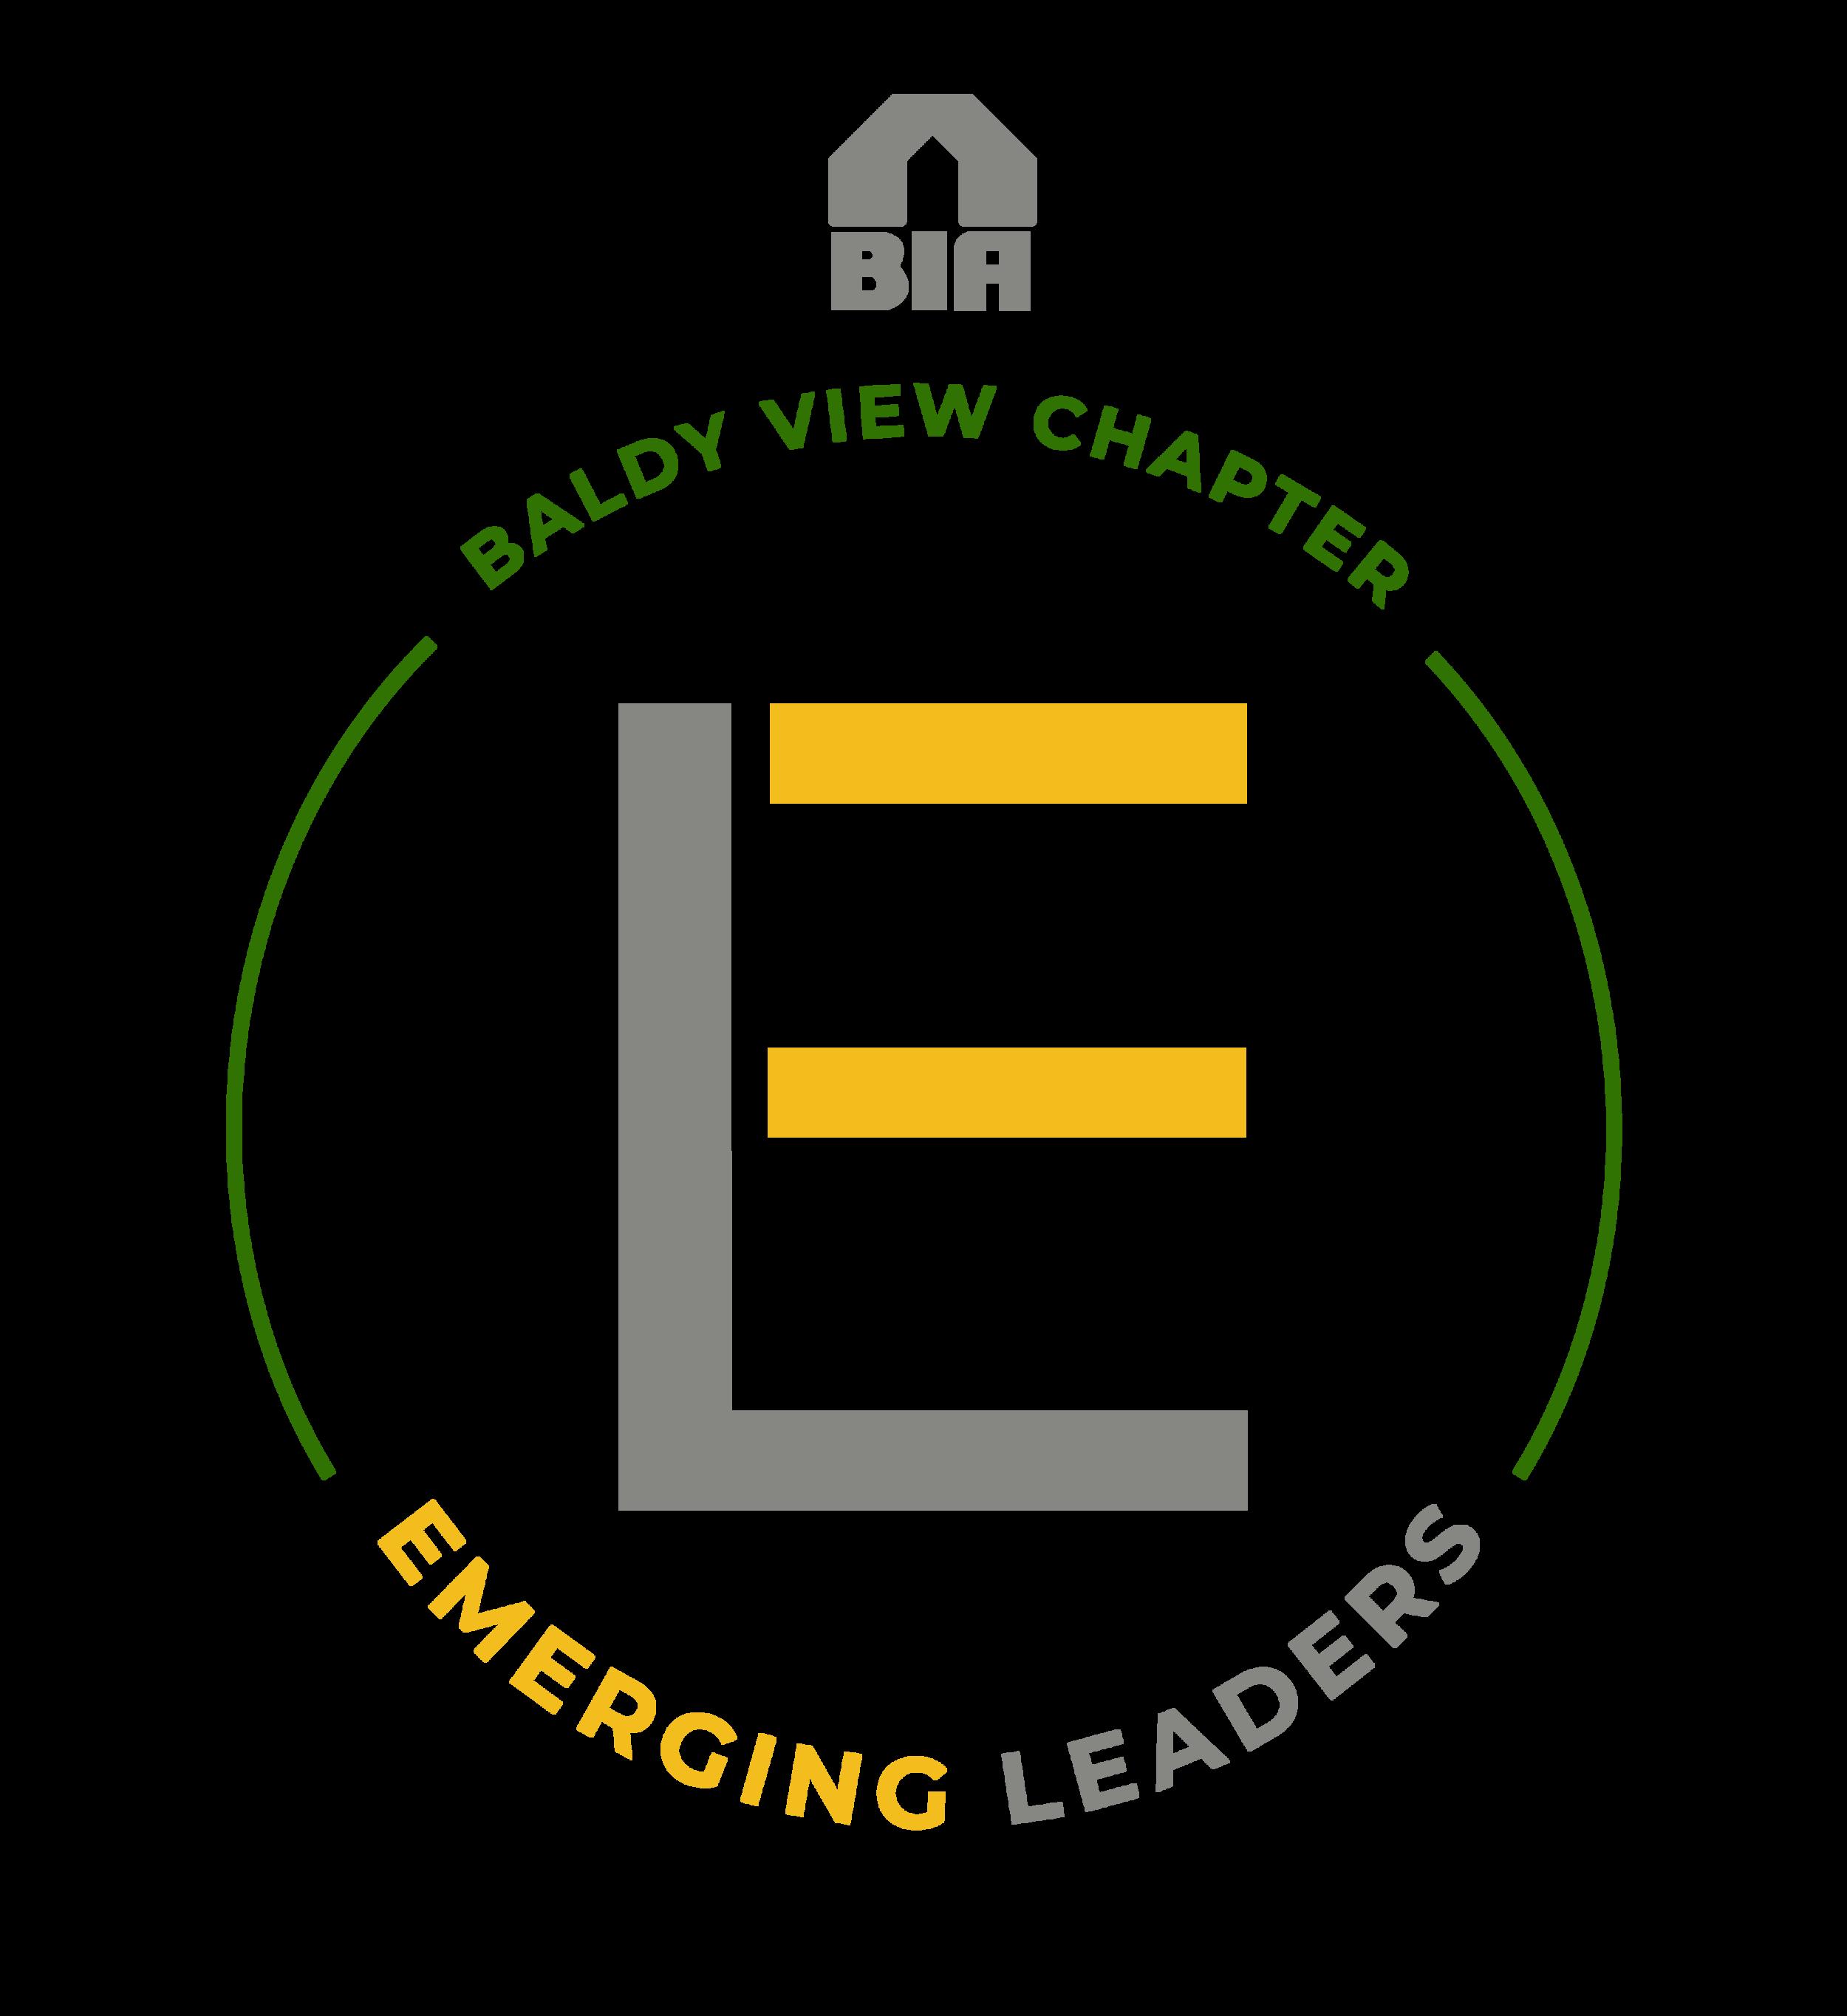 Emerging Leaders Final Logo - trans_Final Logo.png